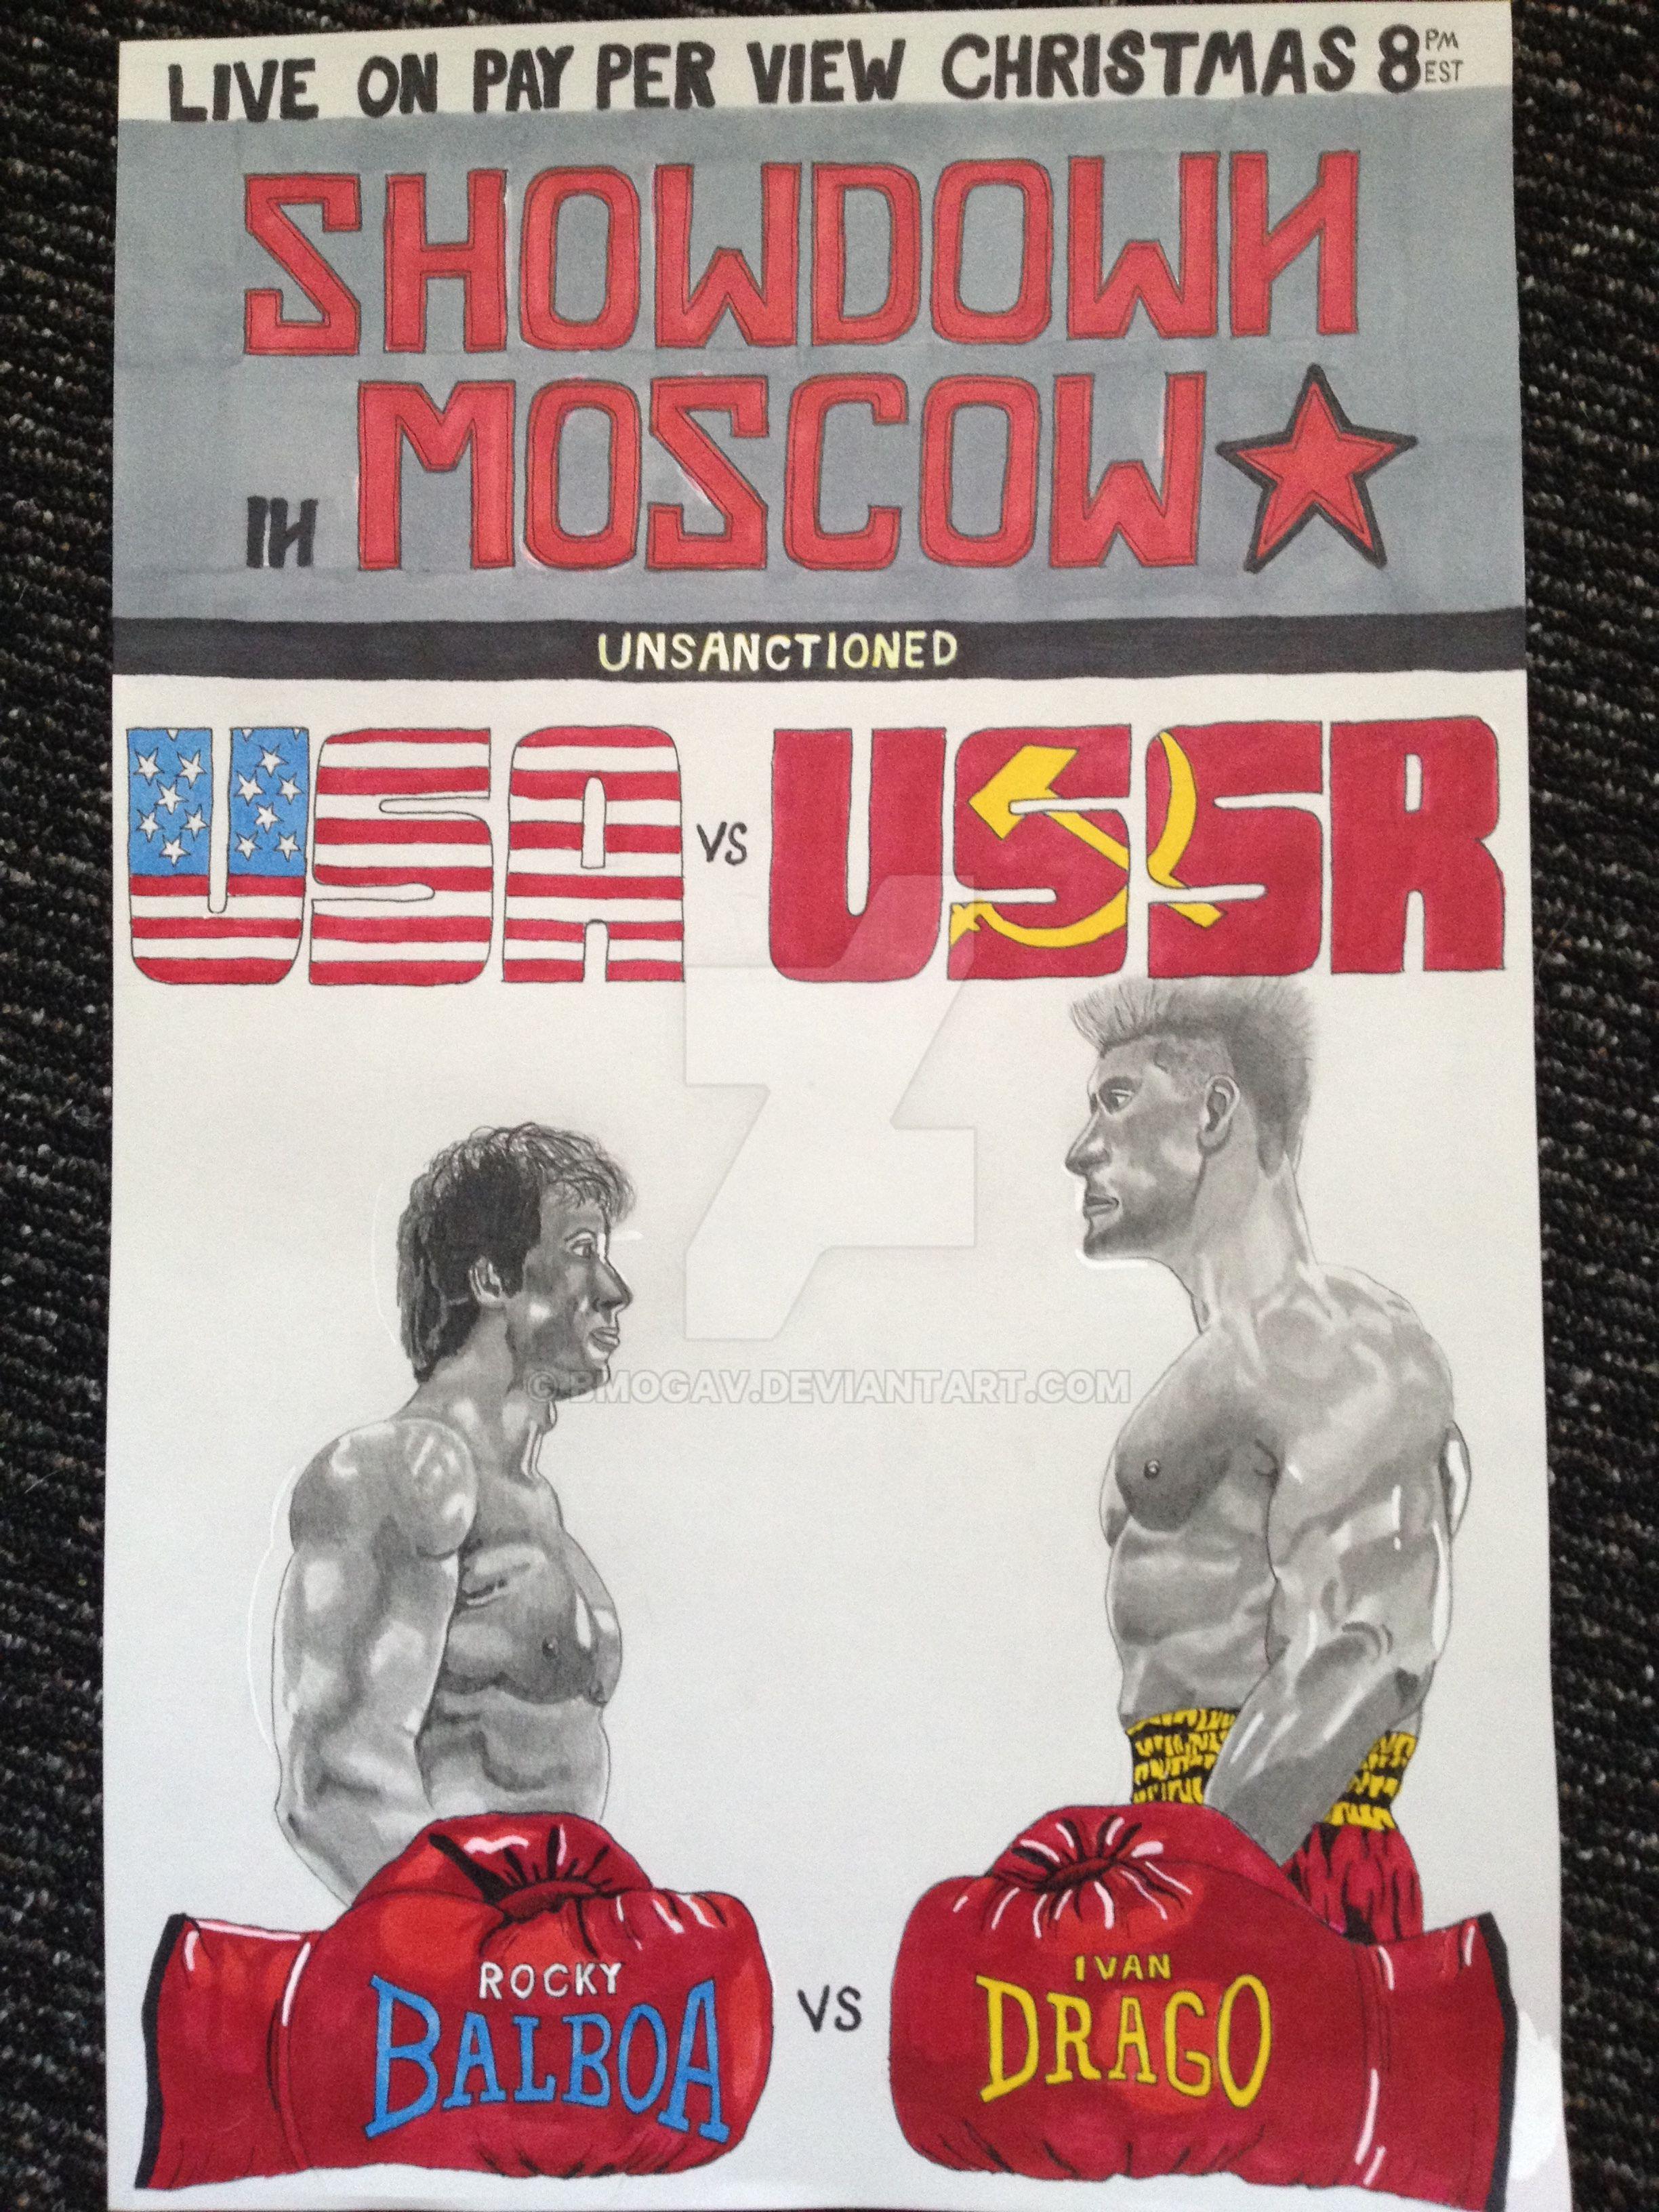 Rocky Balboa vs Ivan Drago poster by bmogav on DeviantArt